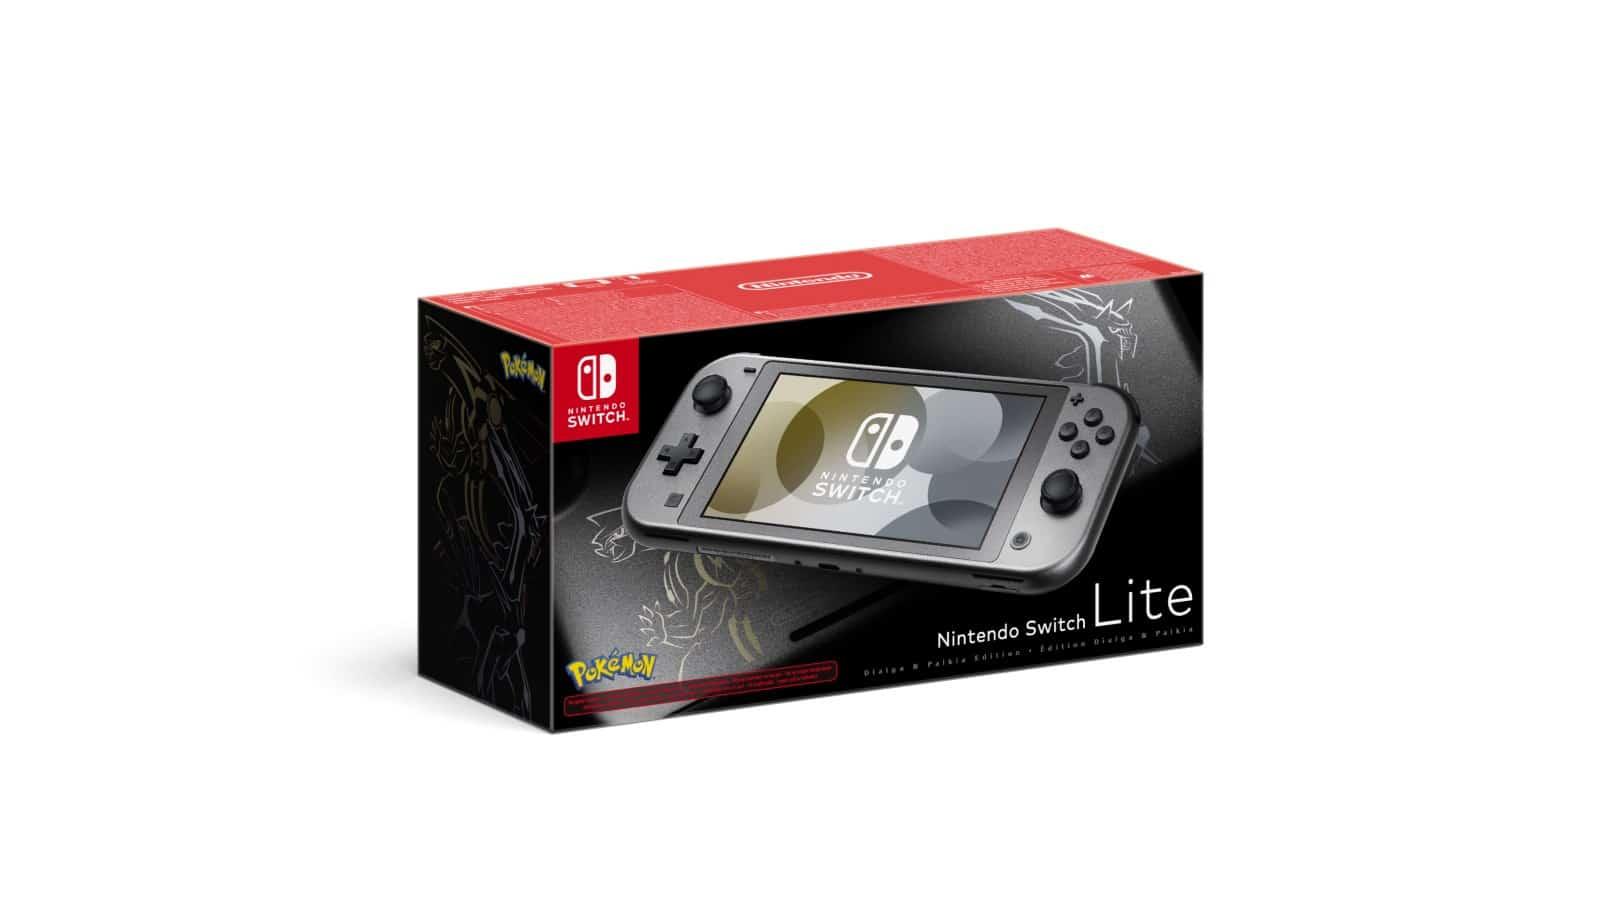 Nintendo Switch Lite - Dialga & Palkia Edition